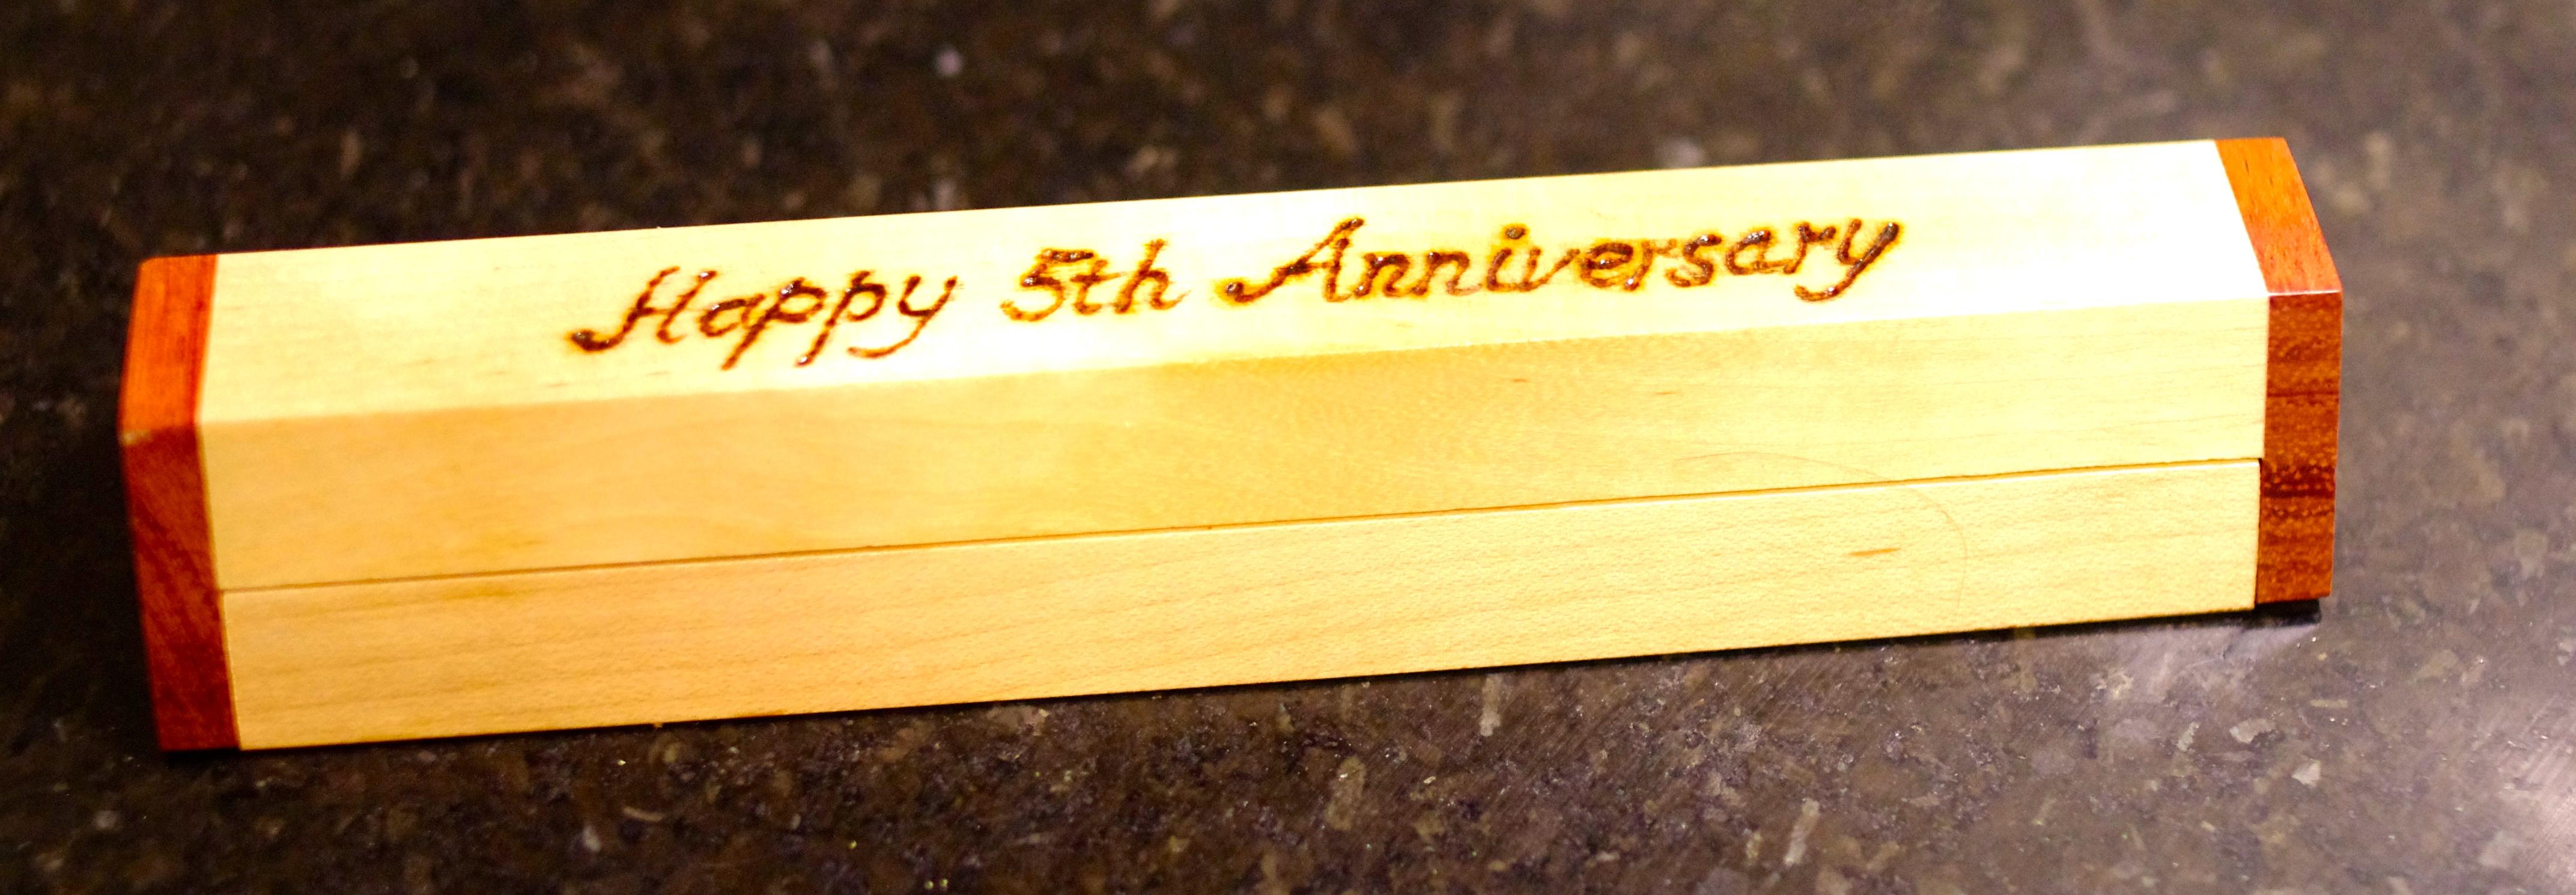 in my kitchen september 5th wedding anniversary 5th wedding anniversary IMGP IMGP